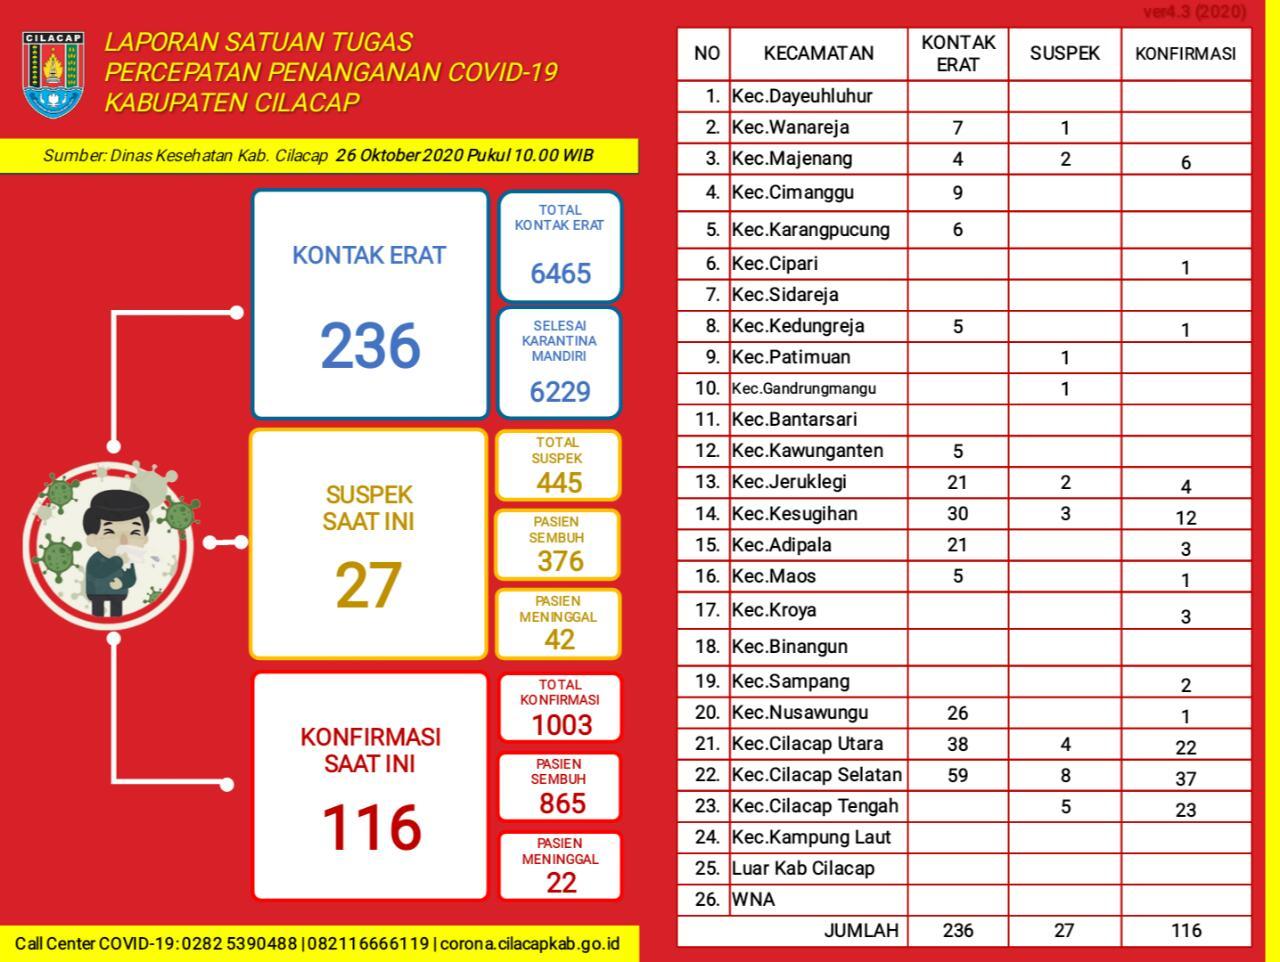 Laporan Satuan Tugas Percepatan Penanganan Covid-19 Kabupaten Cilacap, 26 Oktober 2020